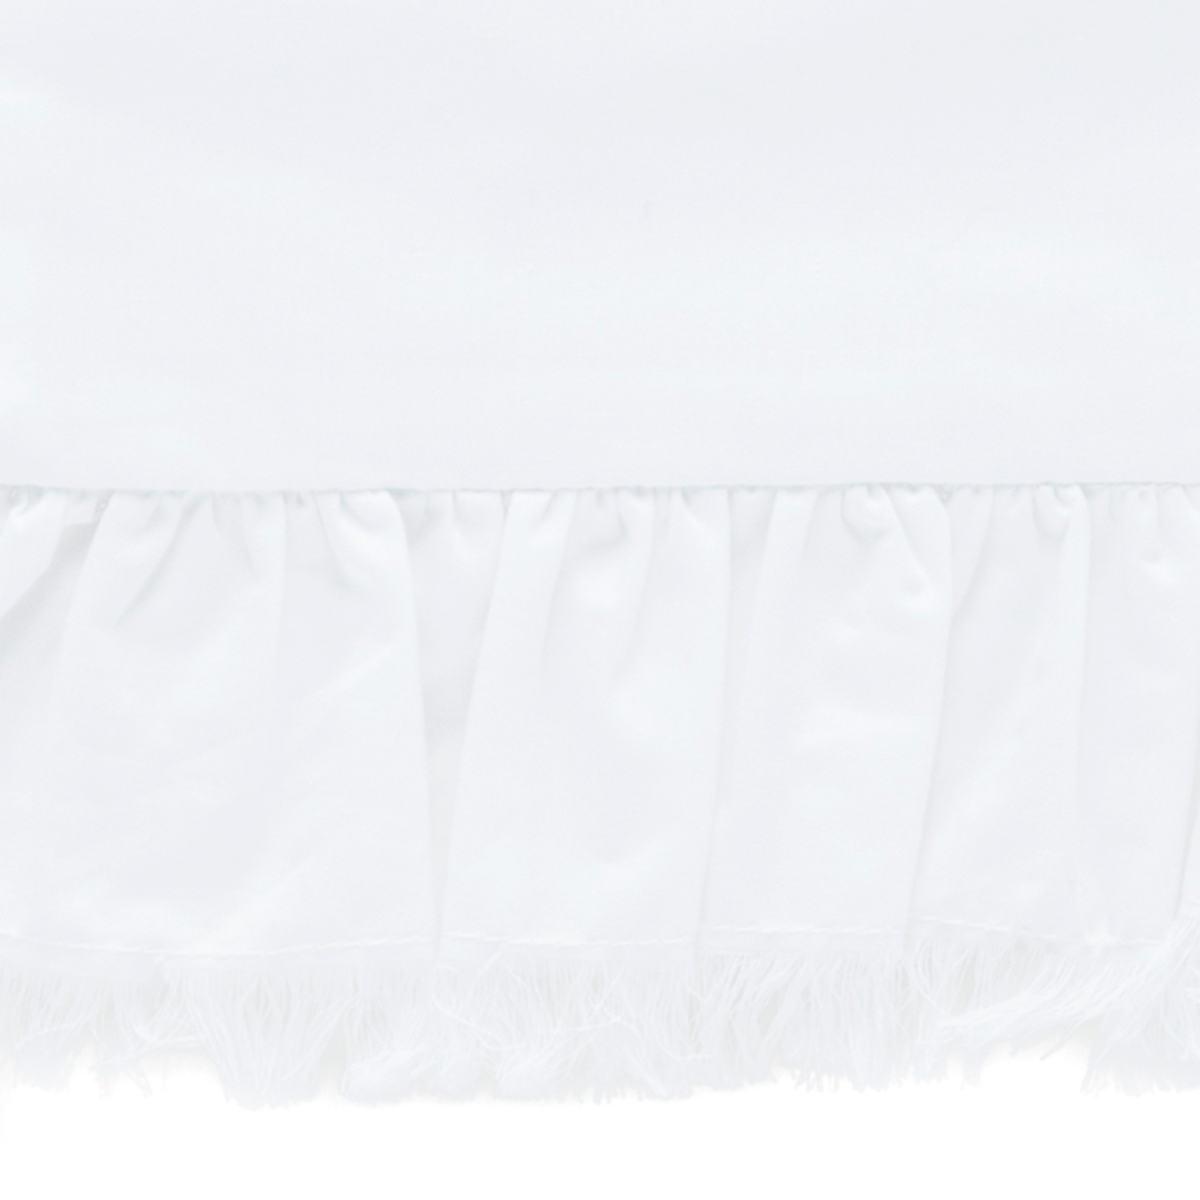 Laundered Ruffle White Swatch